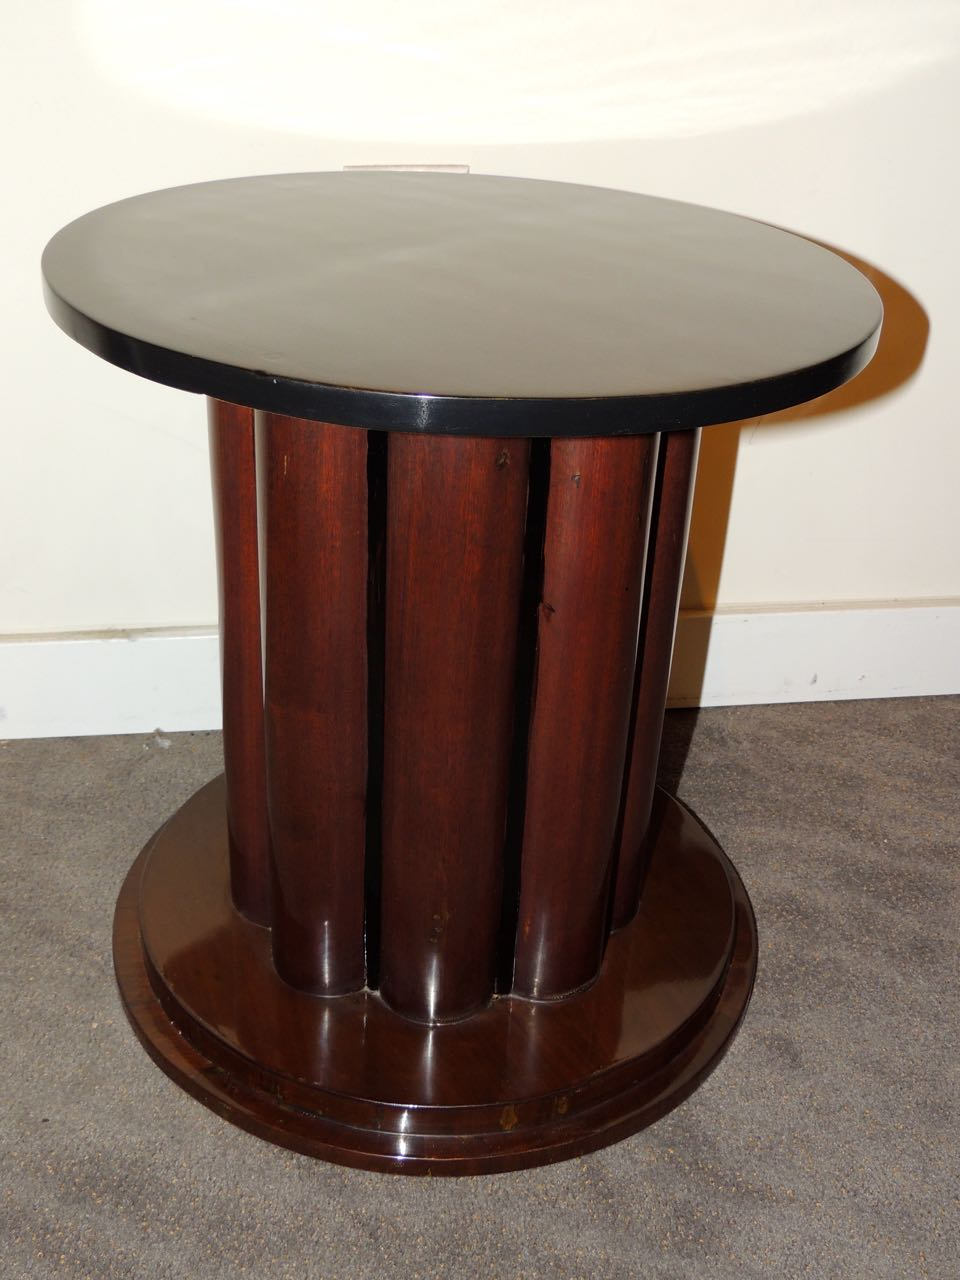 art deco table stool pedestal small tables art deco. Black Bedroom Furniture Sets. Home Design Ideas